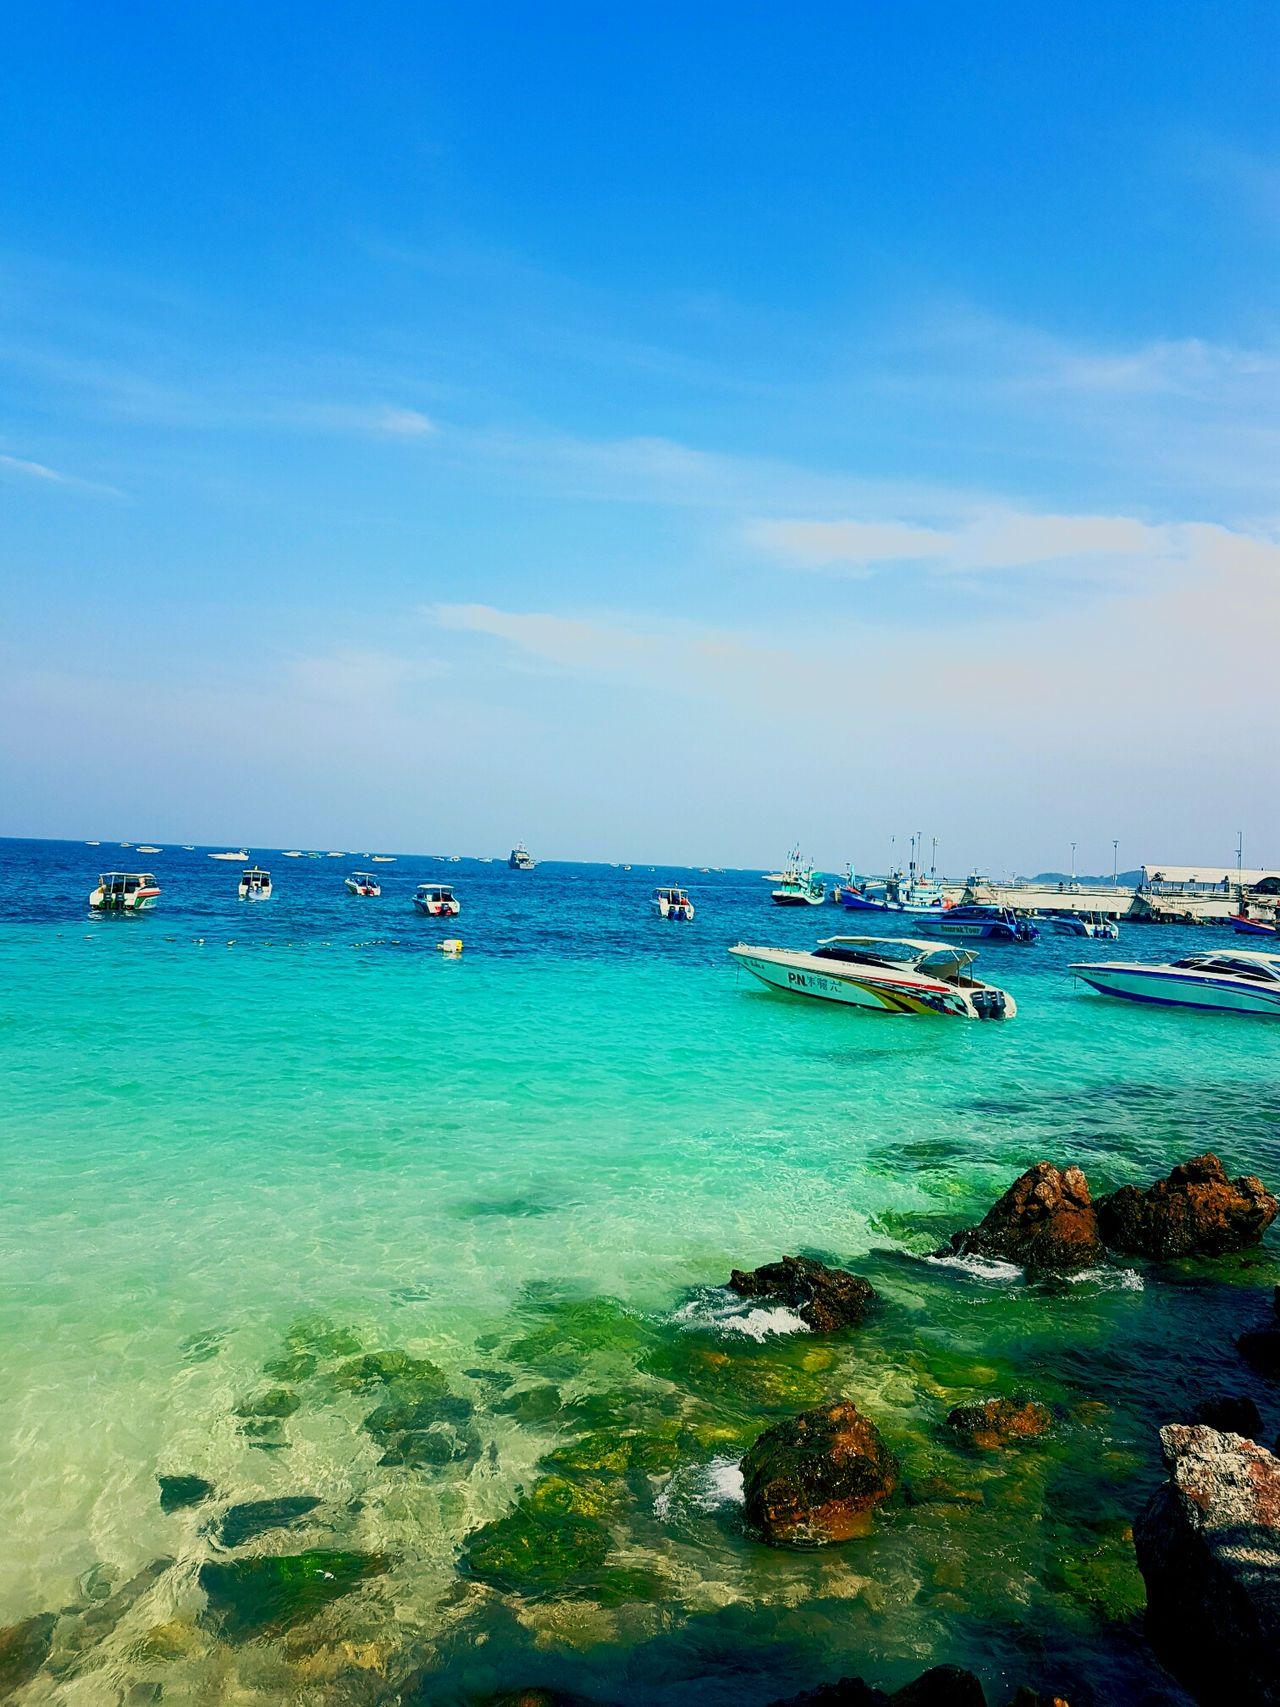 Koh Larn Sea Sea Life Beach With Clear Blue Sky And Sea Warer